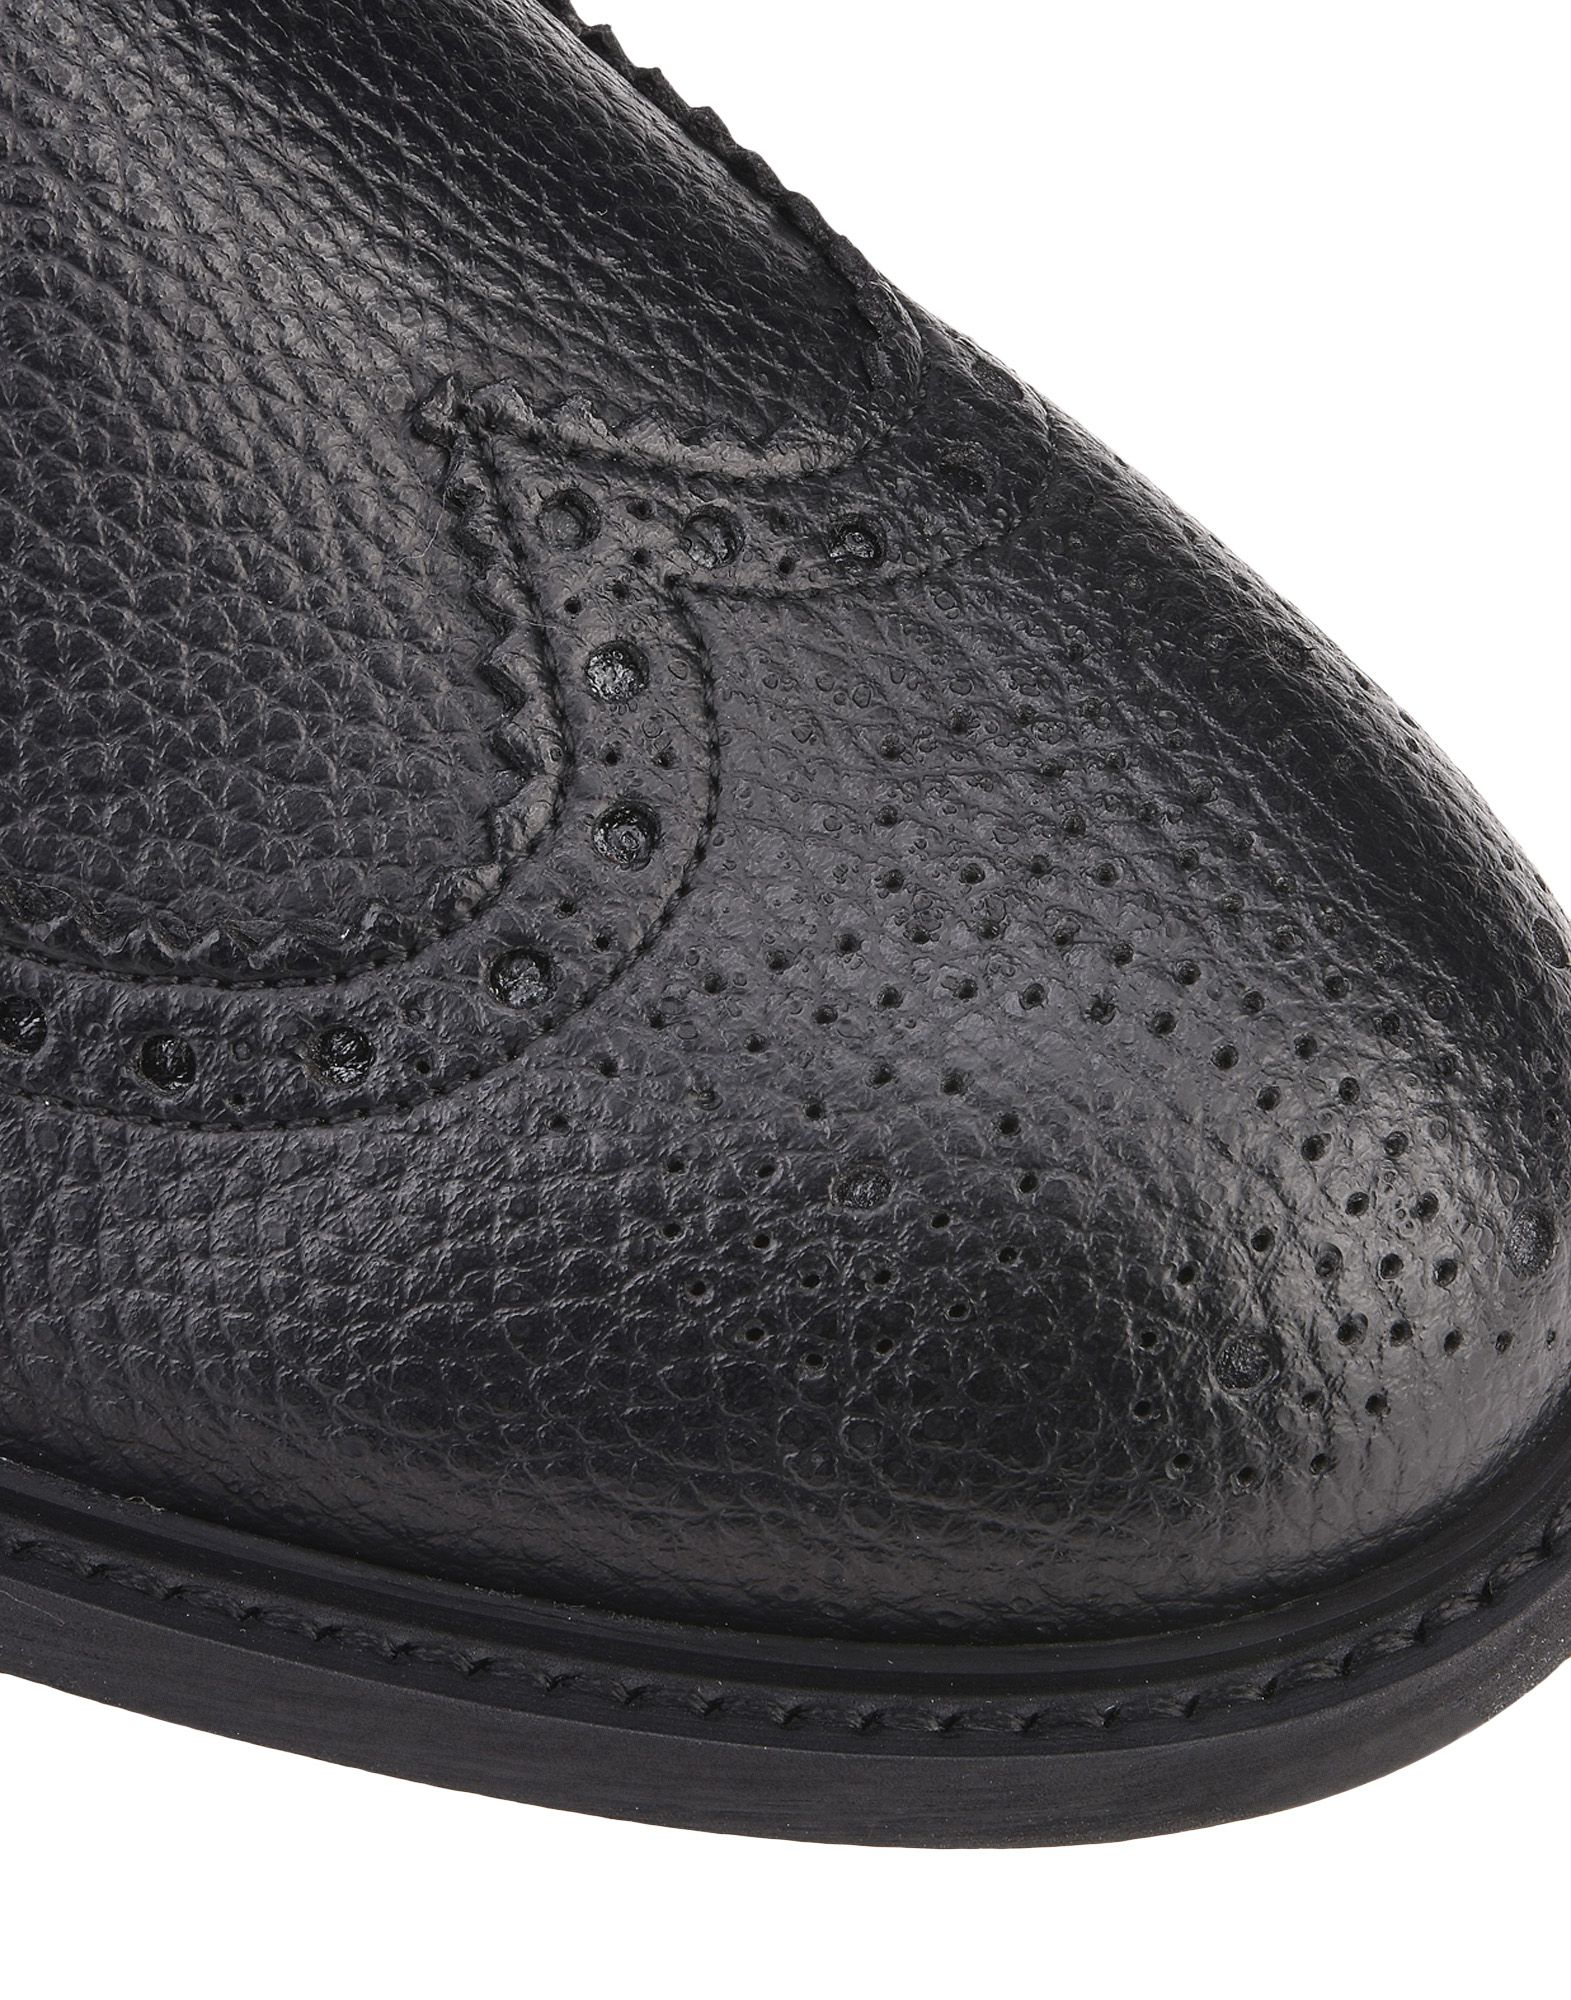 Brave Gentleman Schnürschuhe Schuhe Herren  11398910TS Neue Schuhe Schnürschuhe c9e48c